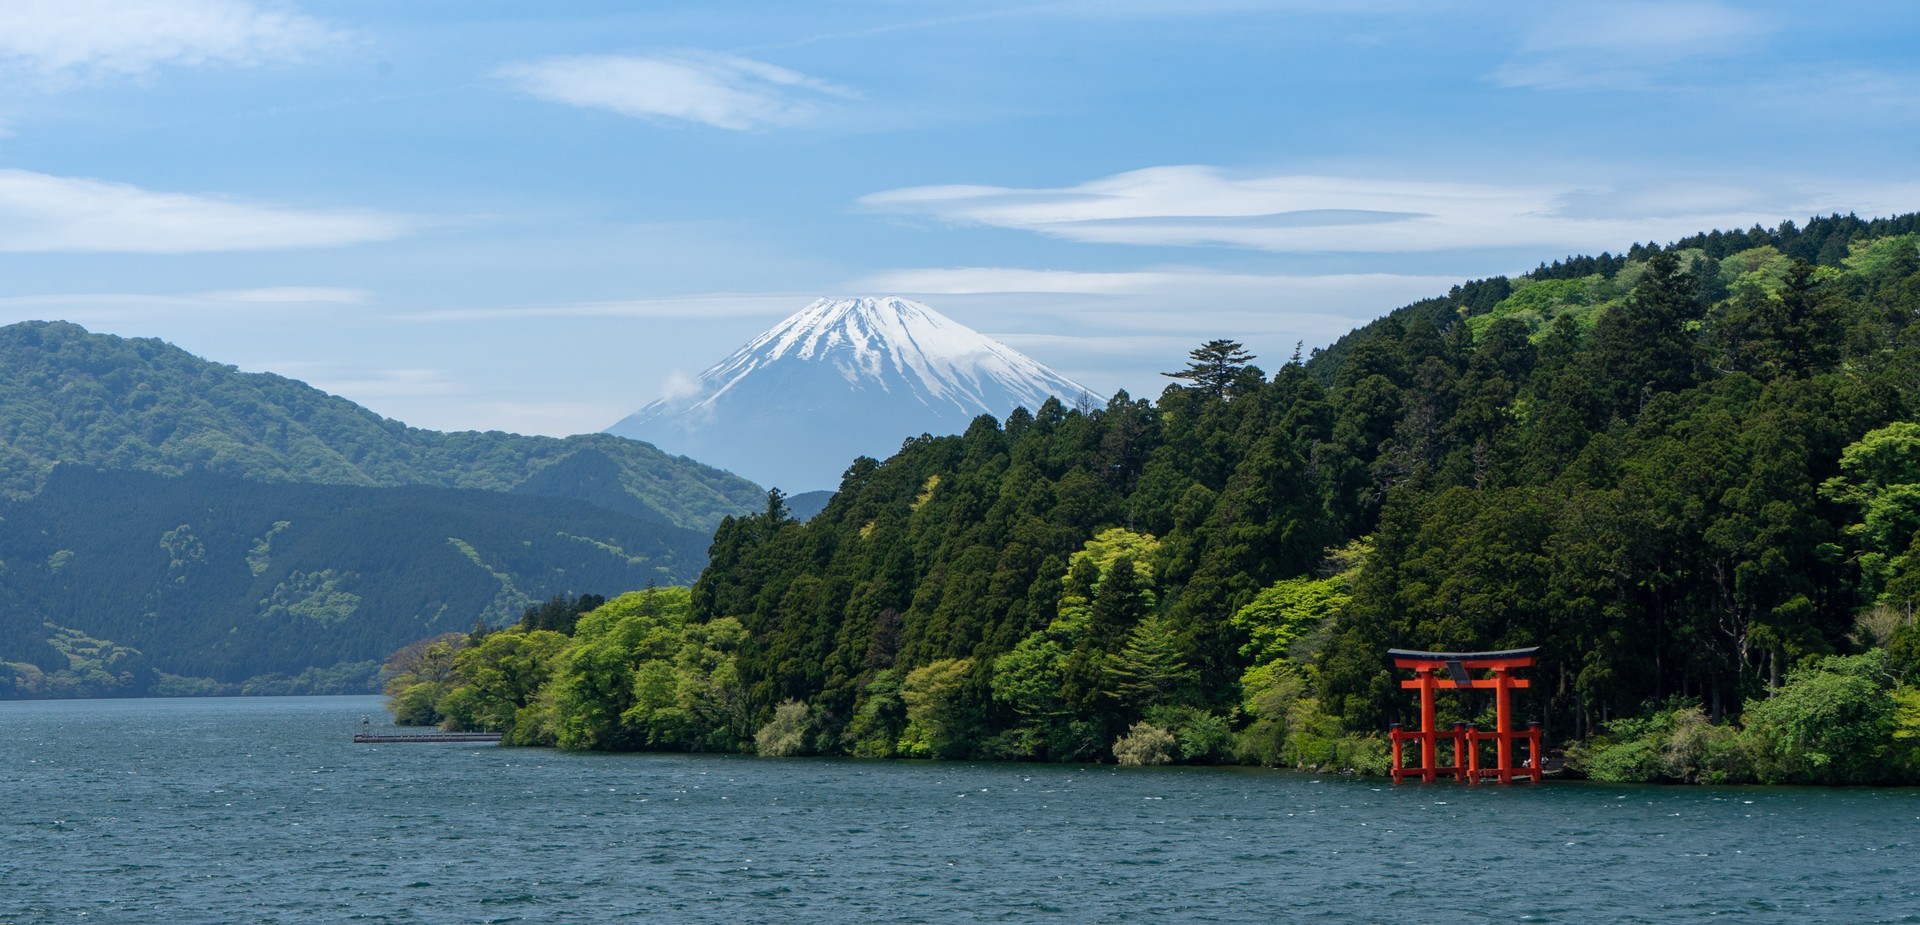 Mount Fuji with Hakone National Park landscape